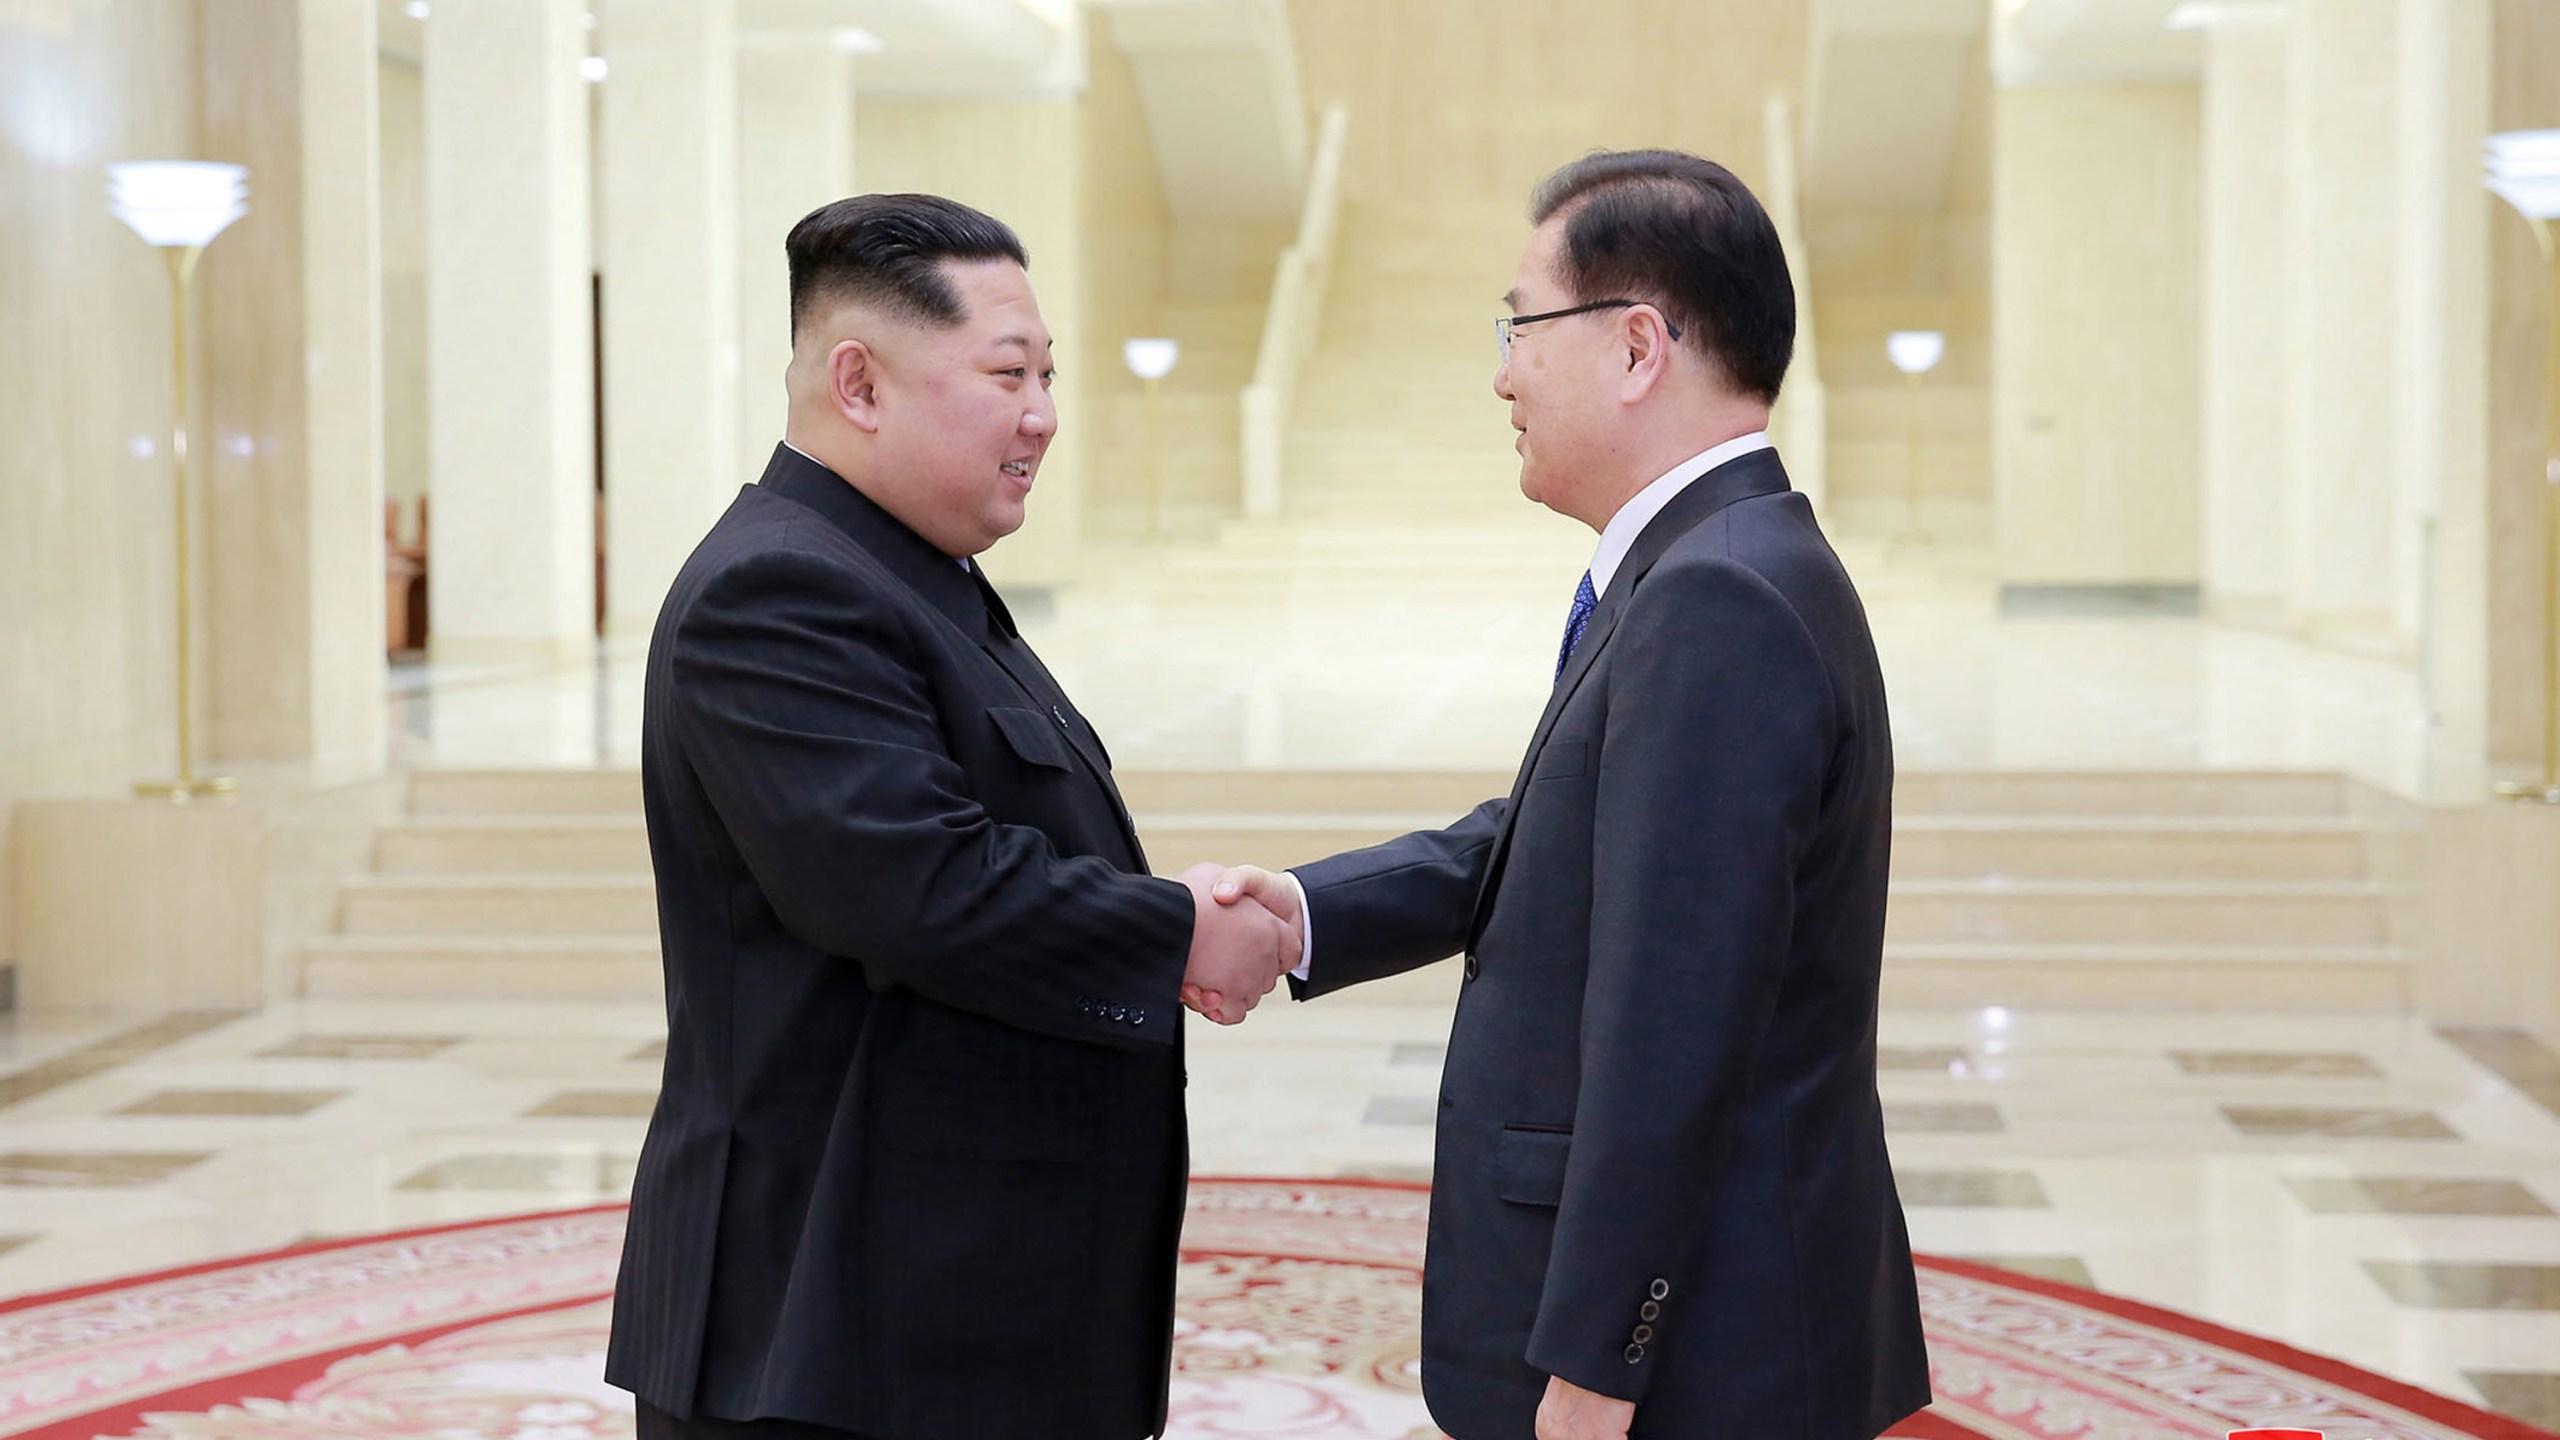 North_Korea_Koreas_Tensions_23304-159532.jpg81616651